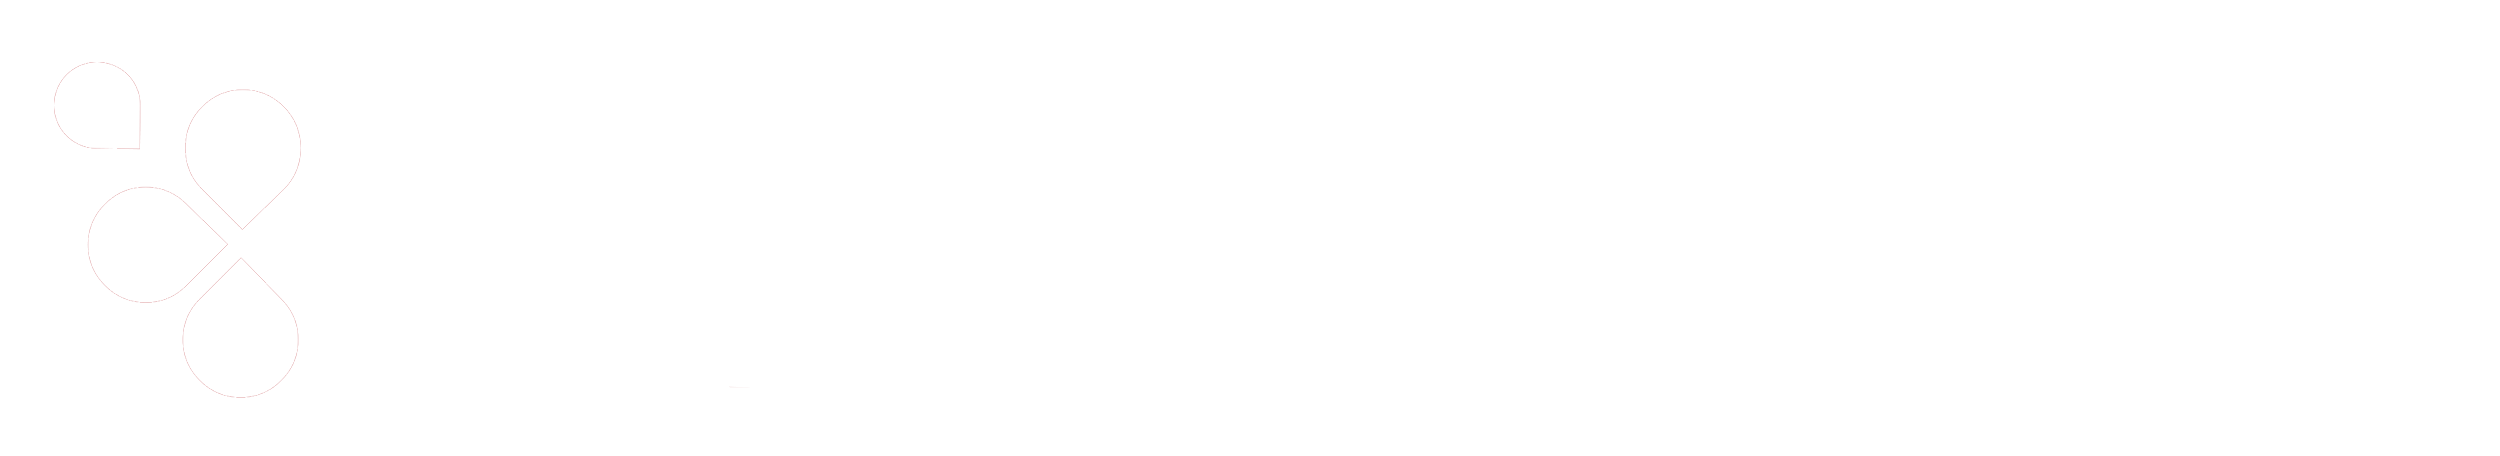 mg-marca